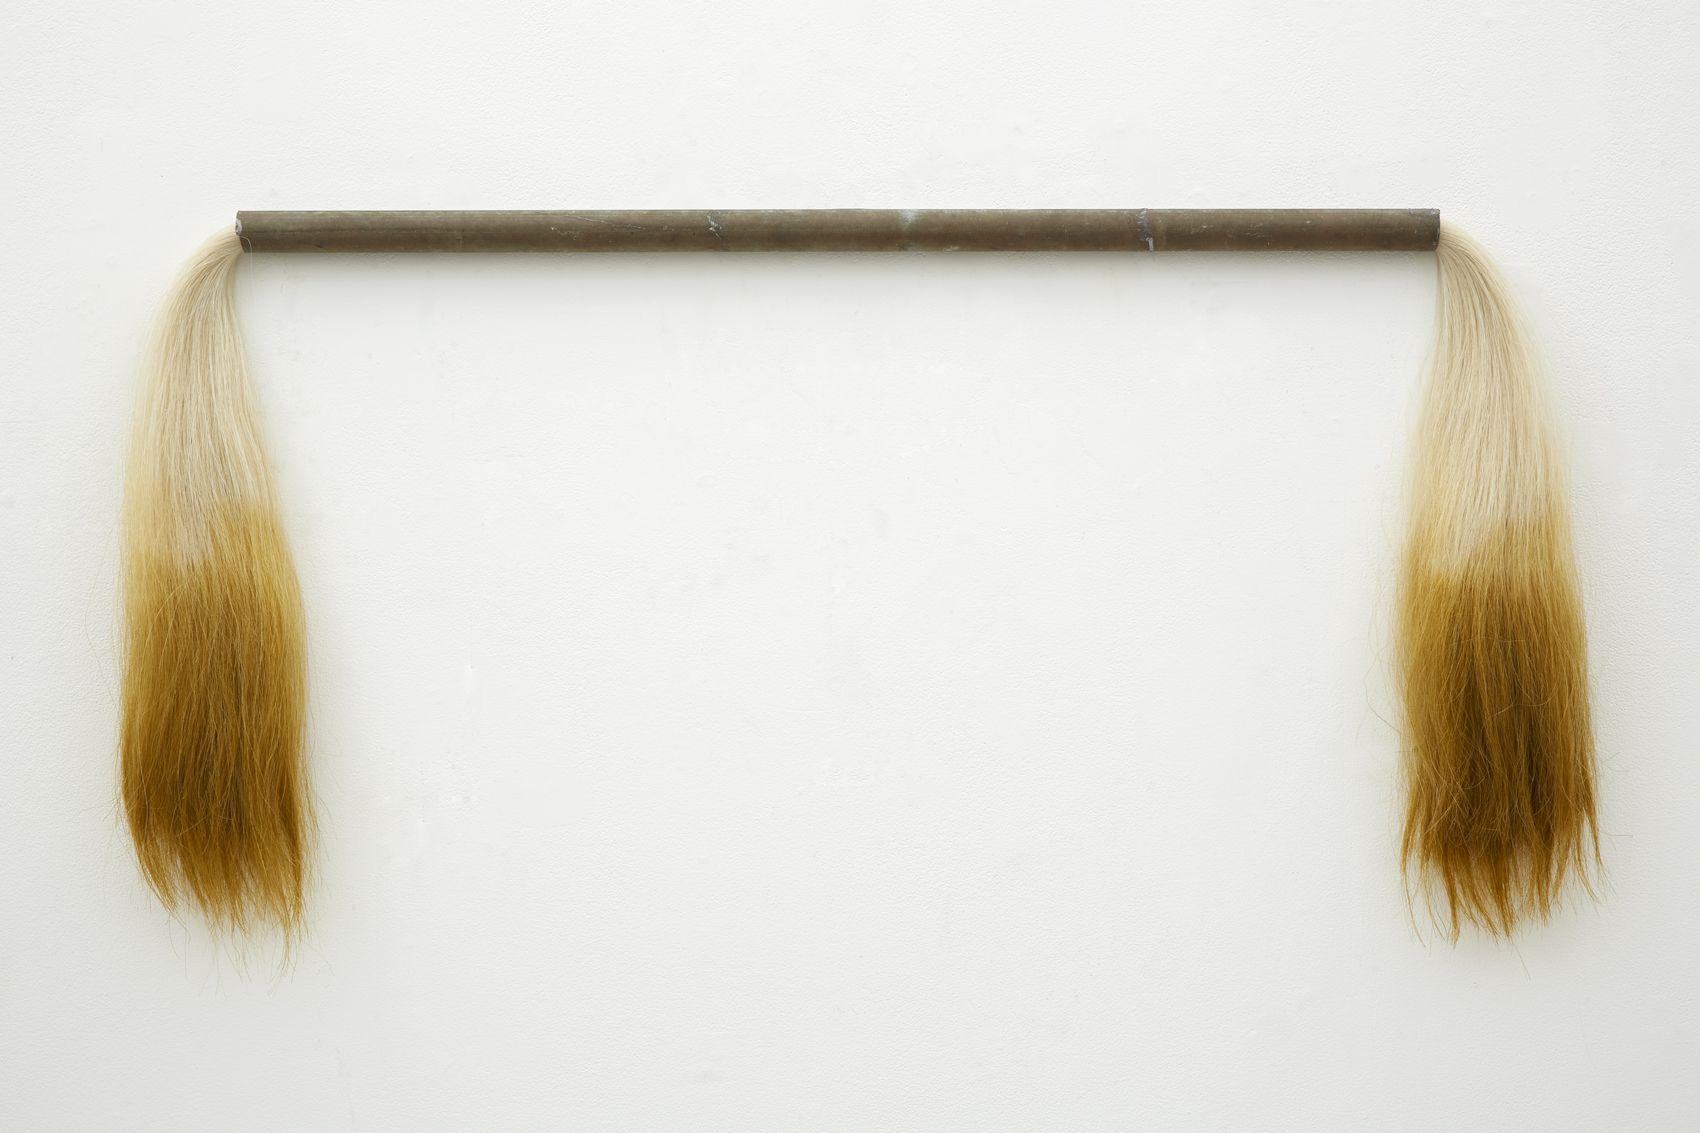 a horse hair sculpture by jay heikes an artist from minneapolis minnesota